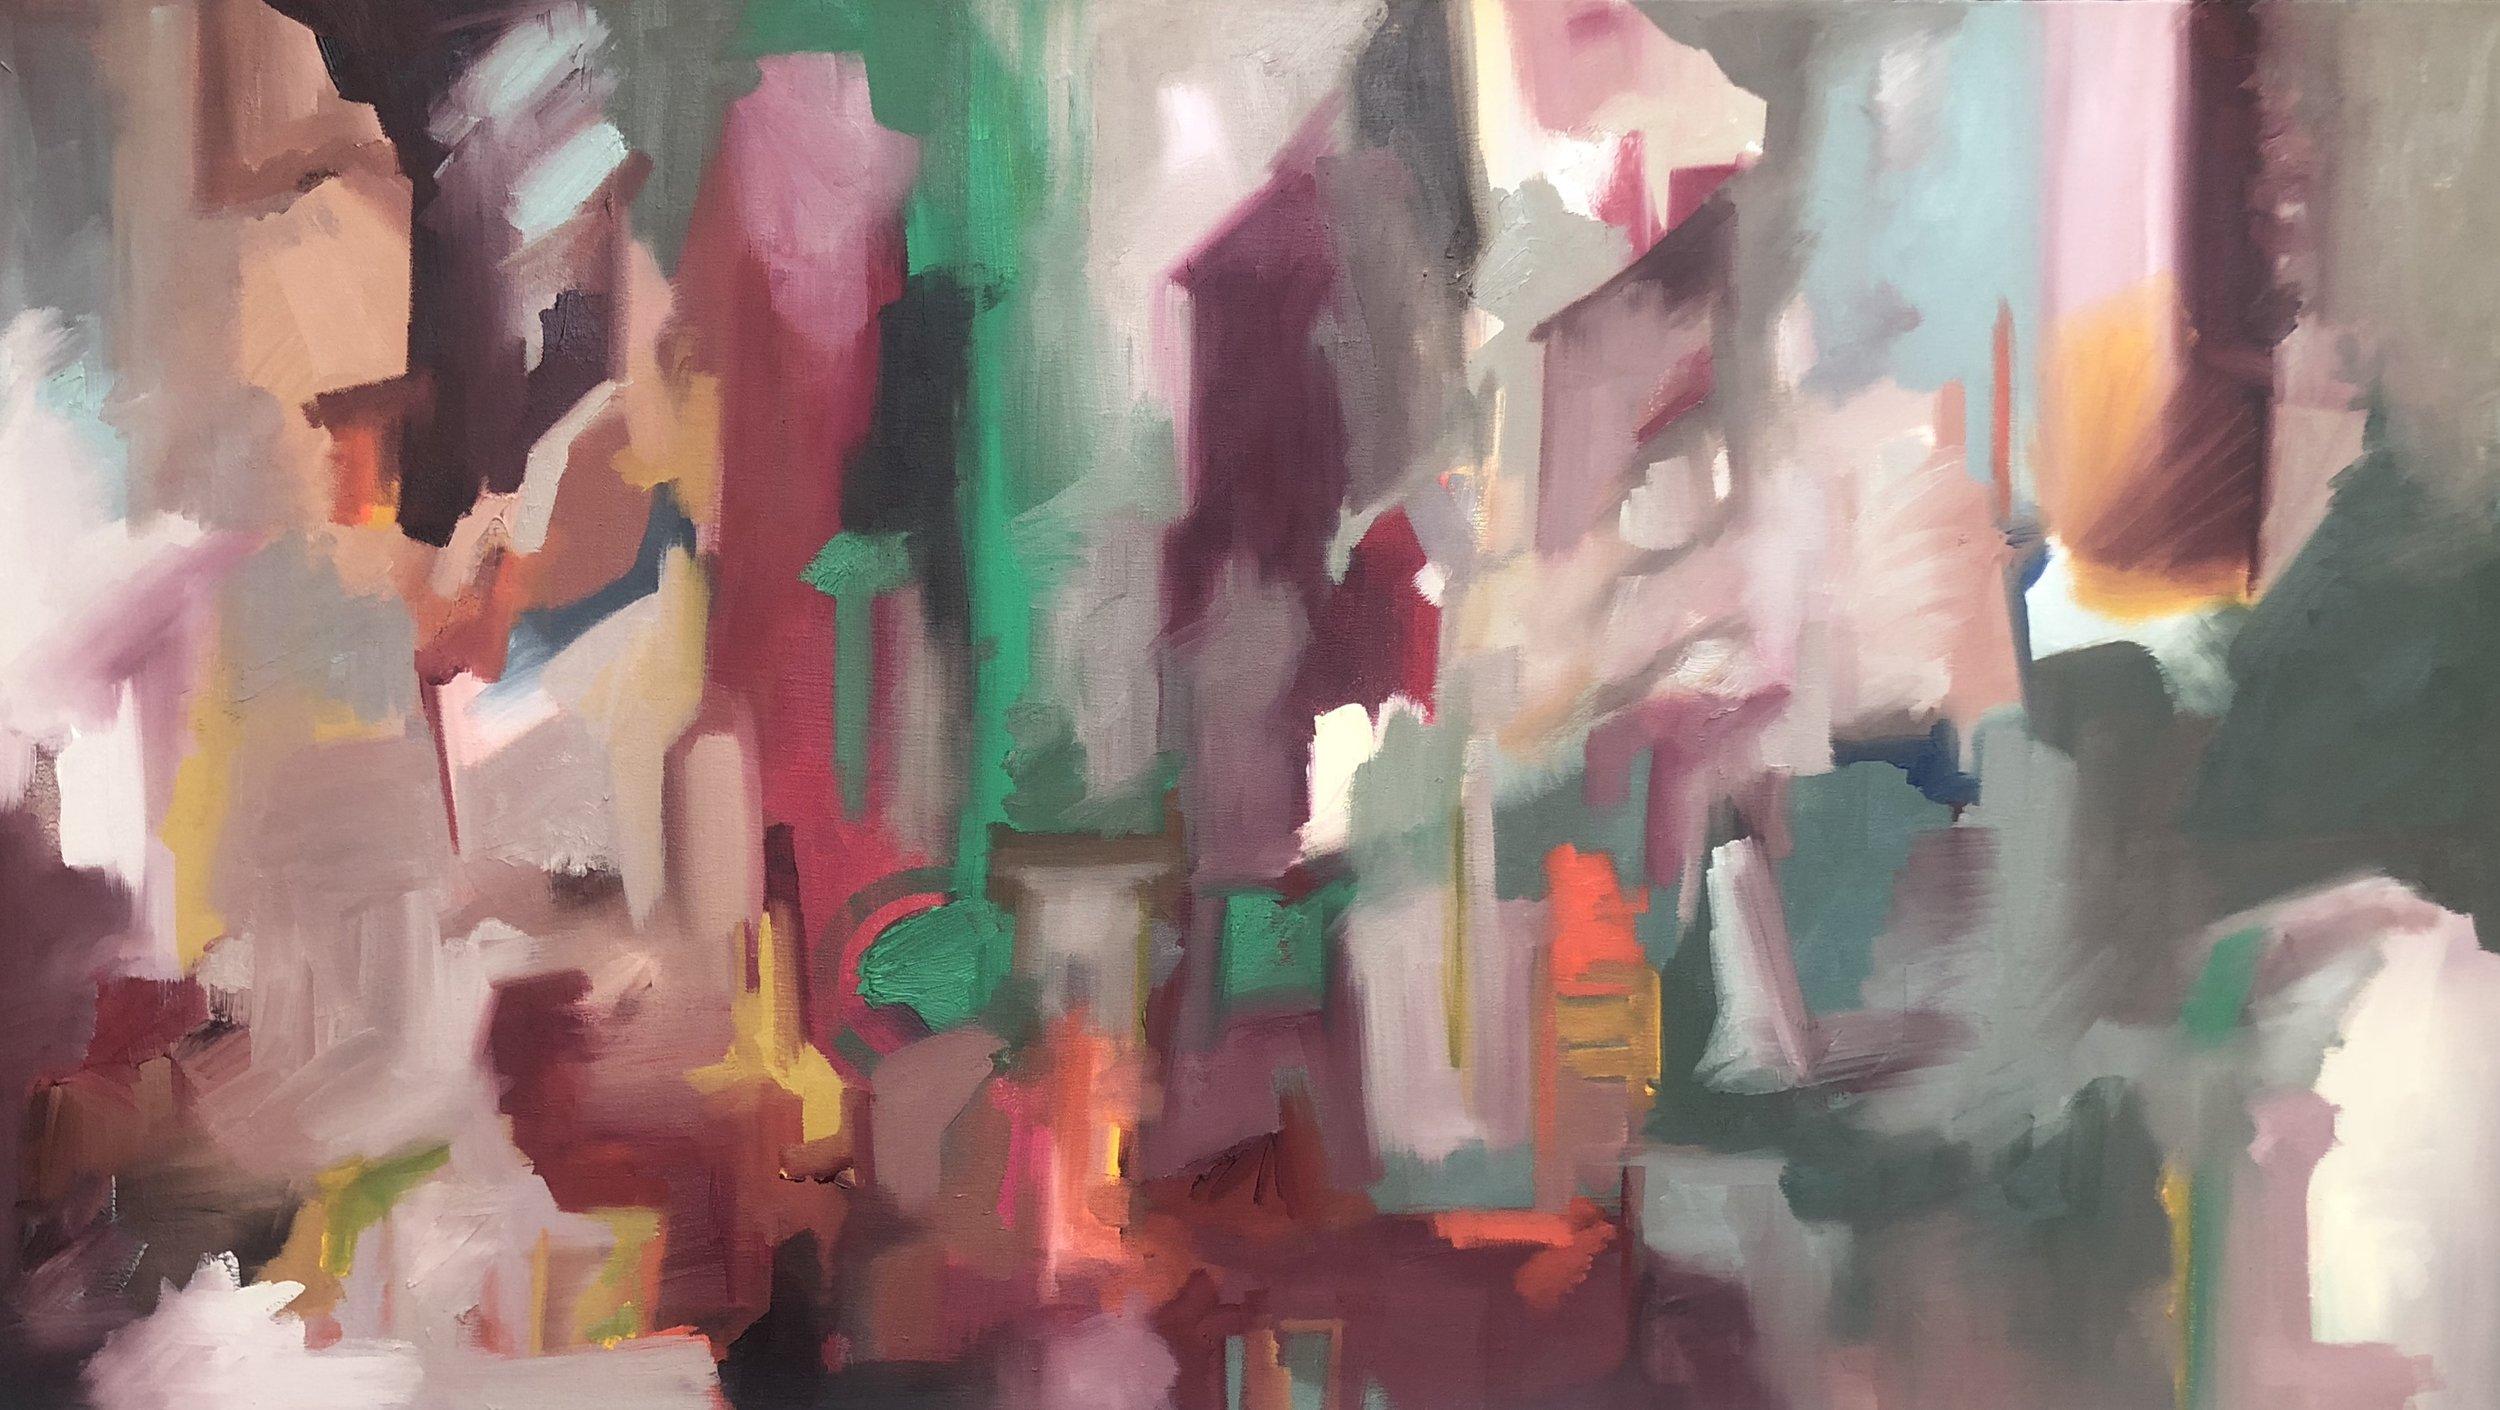 Mementos,  2019. 25 x 46 1/2 in. Oil on Canvas. $750